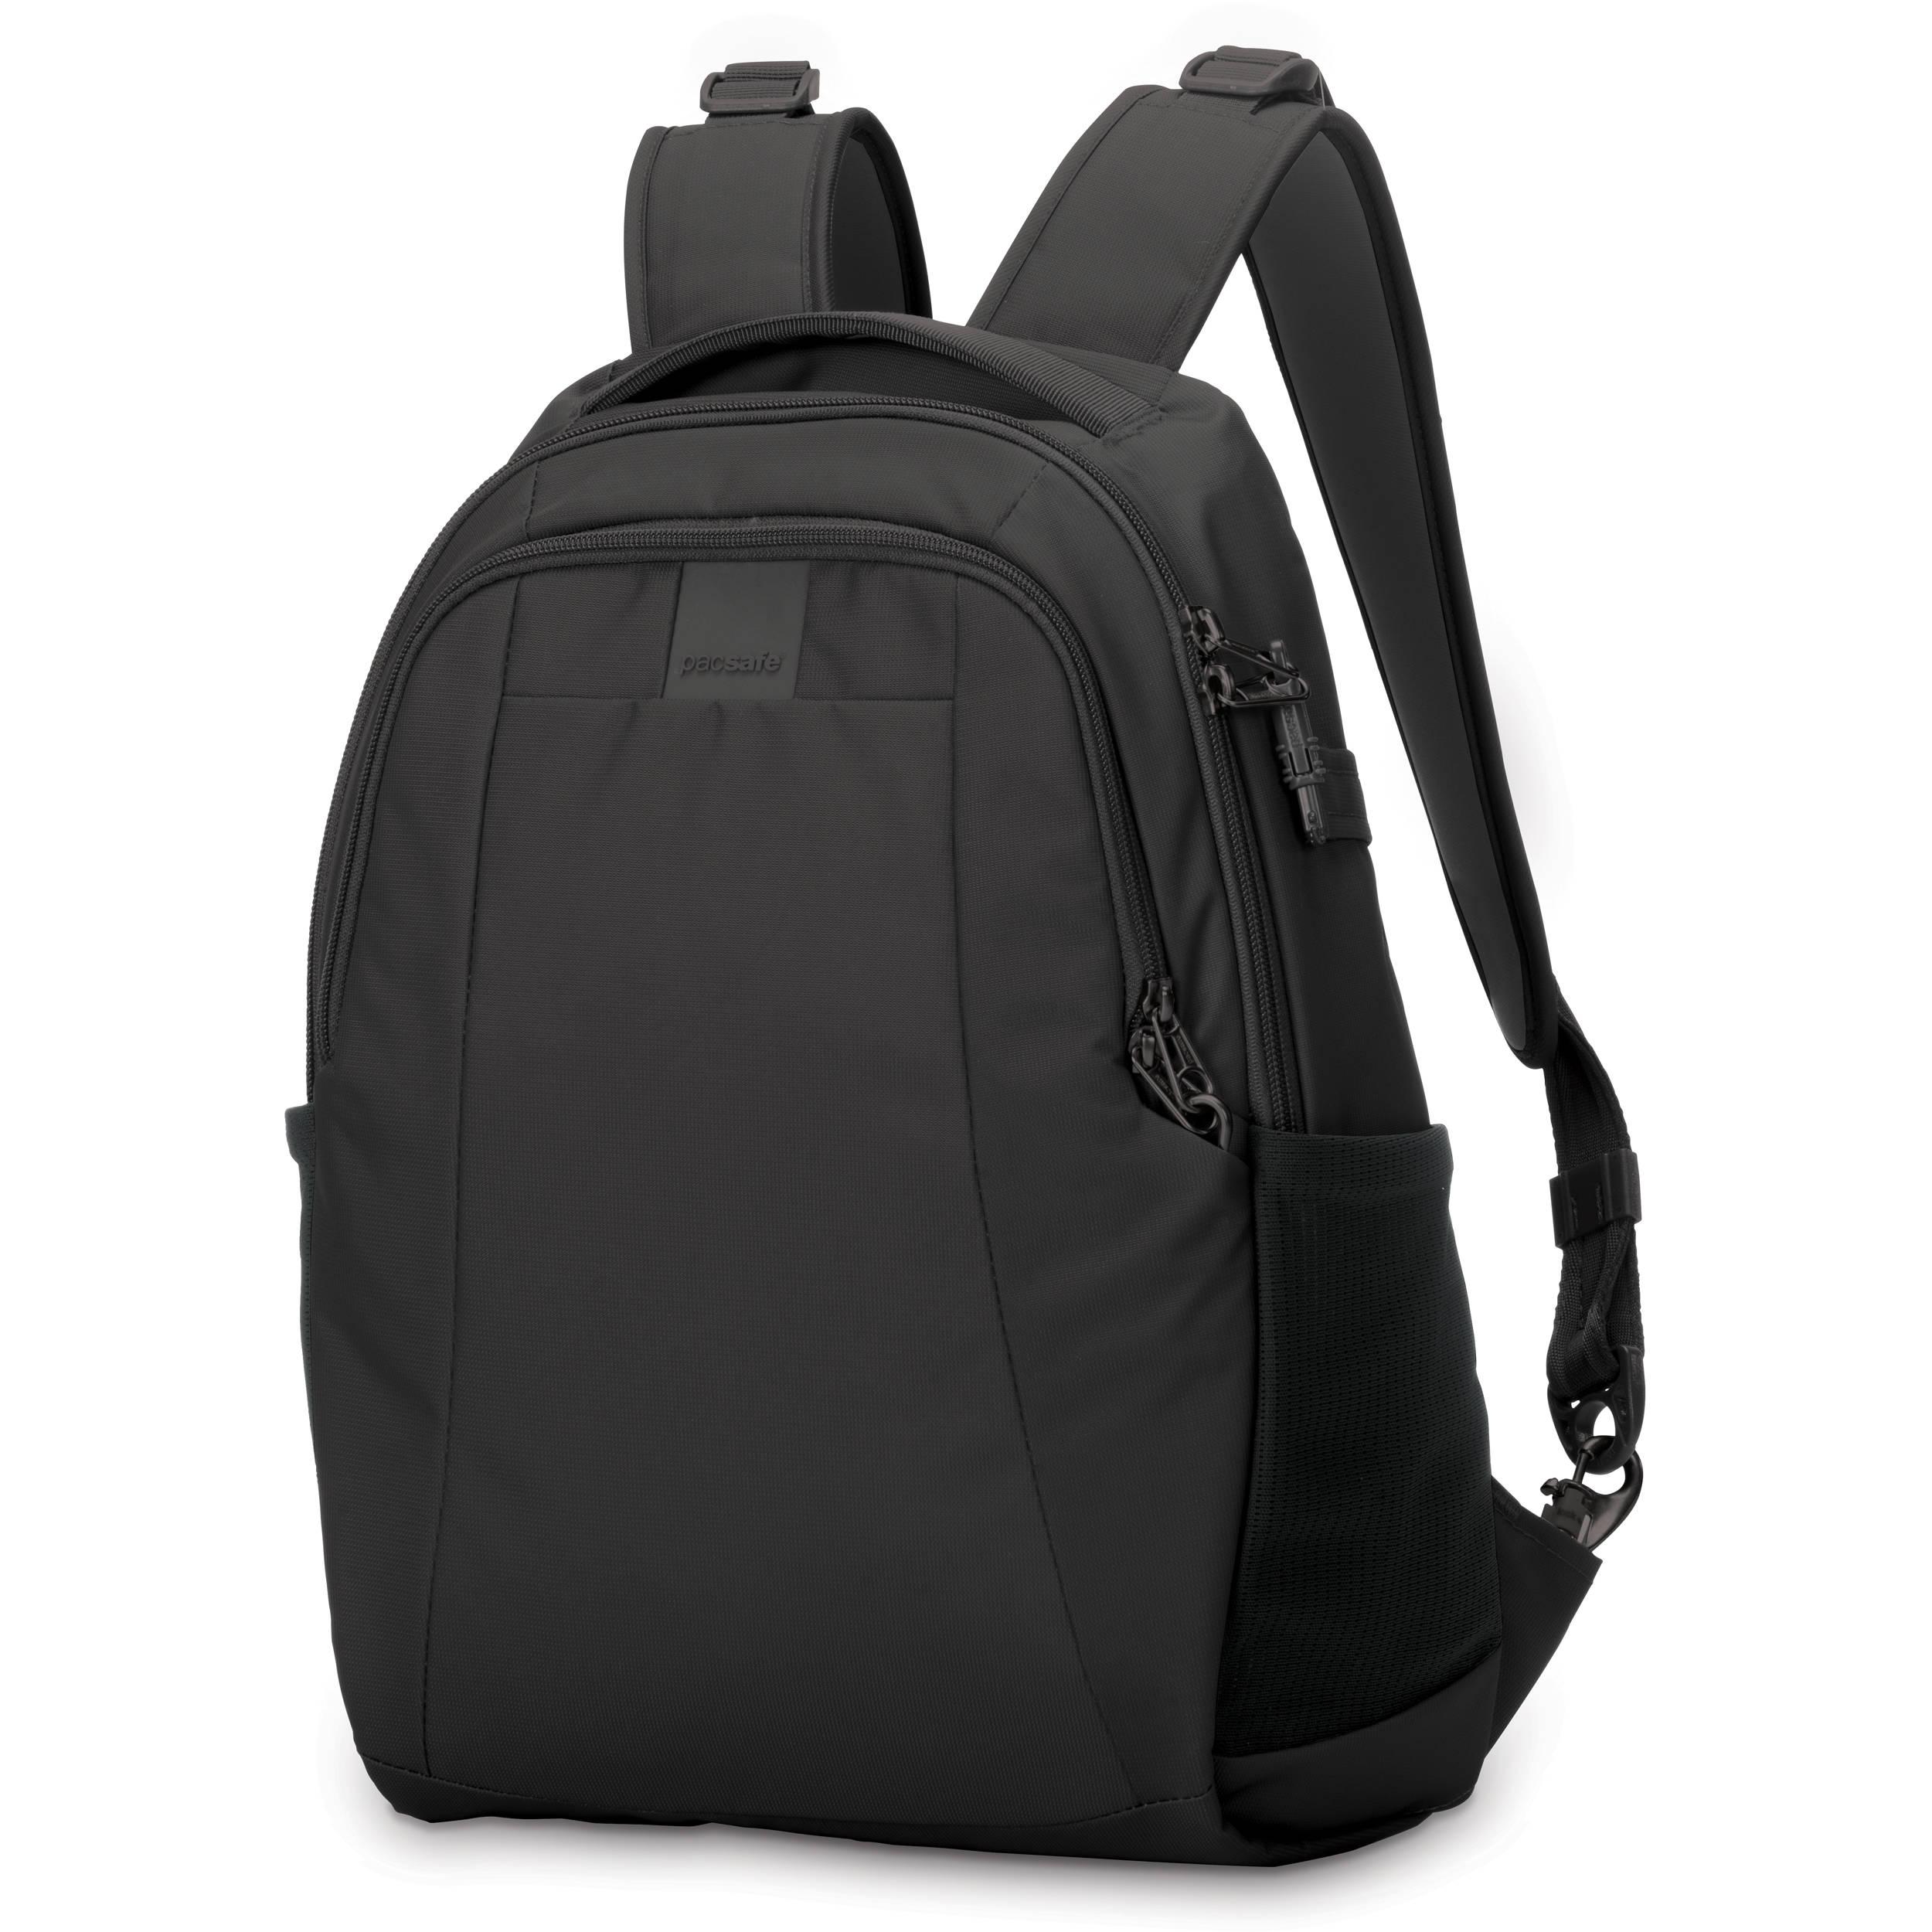 Pacsafe Metrosafe Ls350 Anti Theft Backpack 15l Black